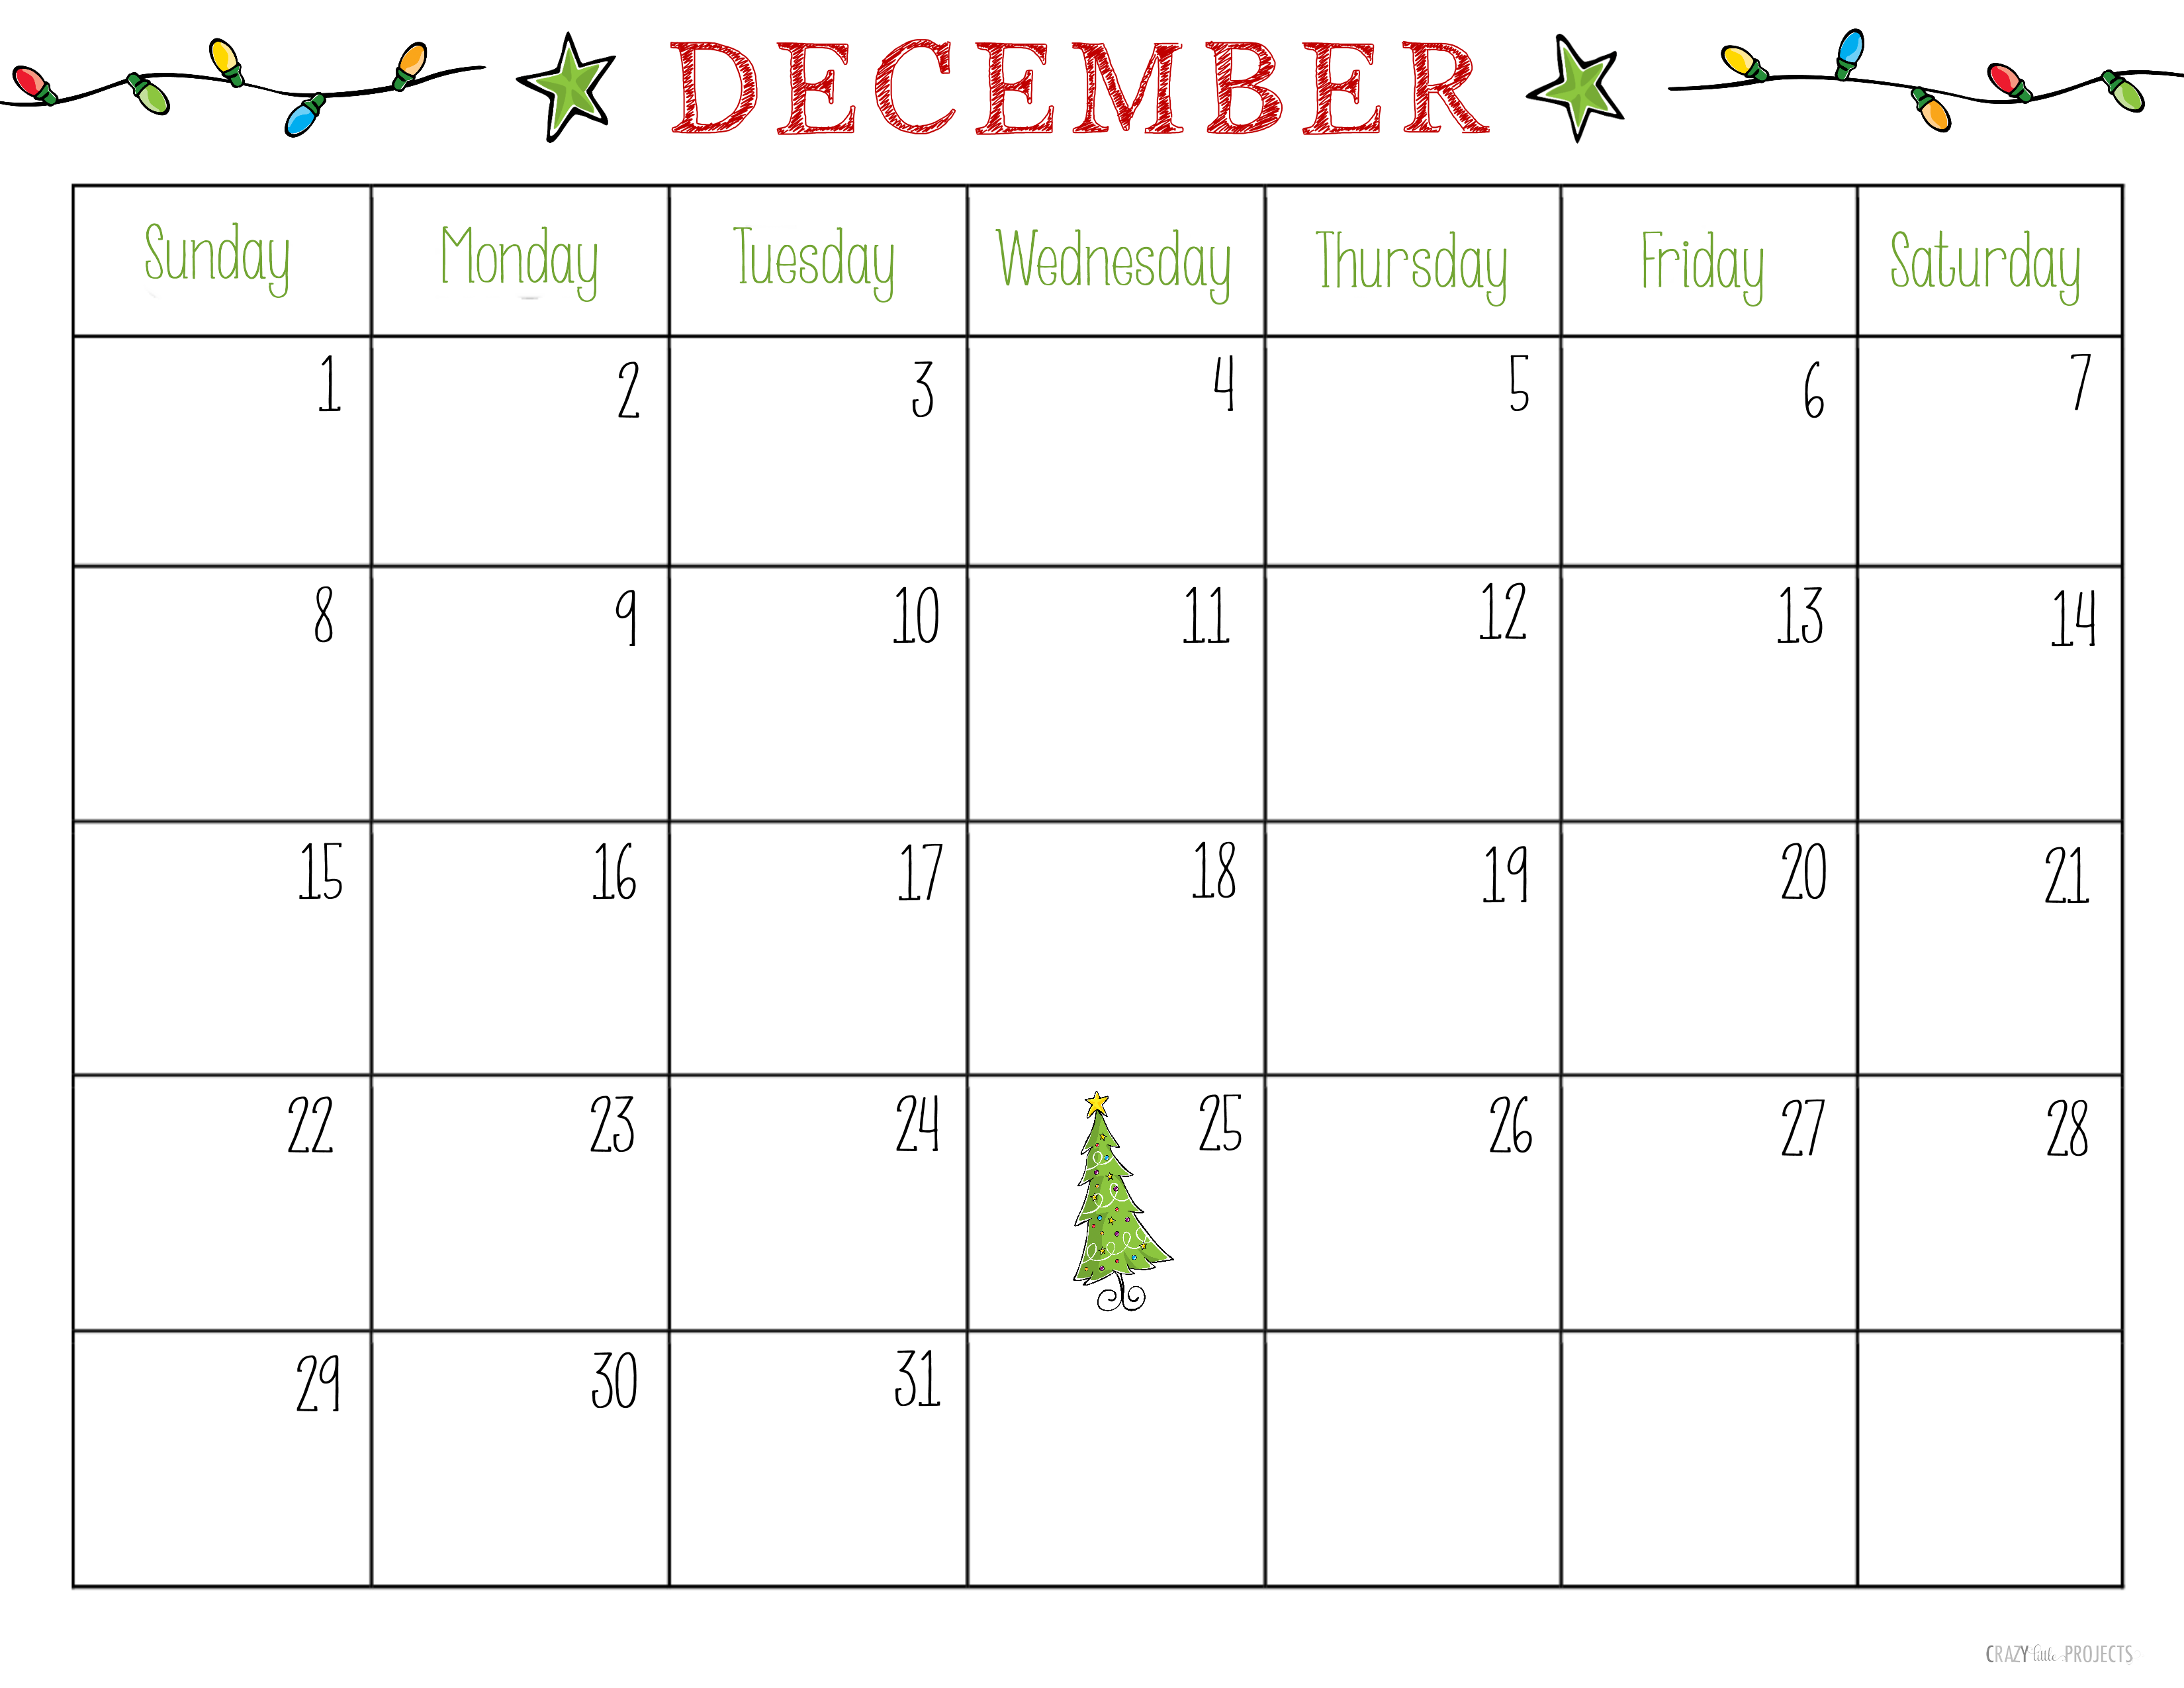 Free Printable Christmas Calendar December 2014